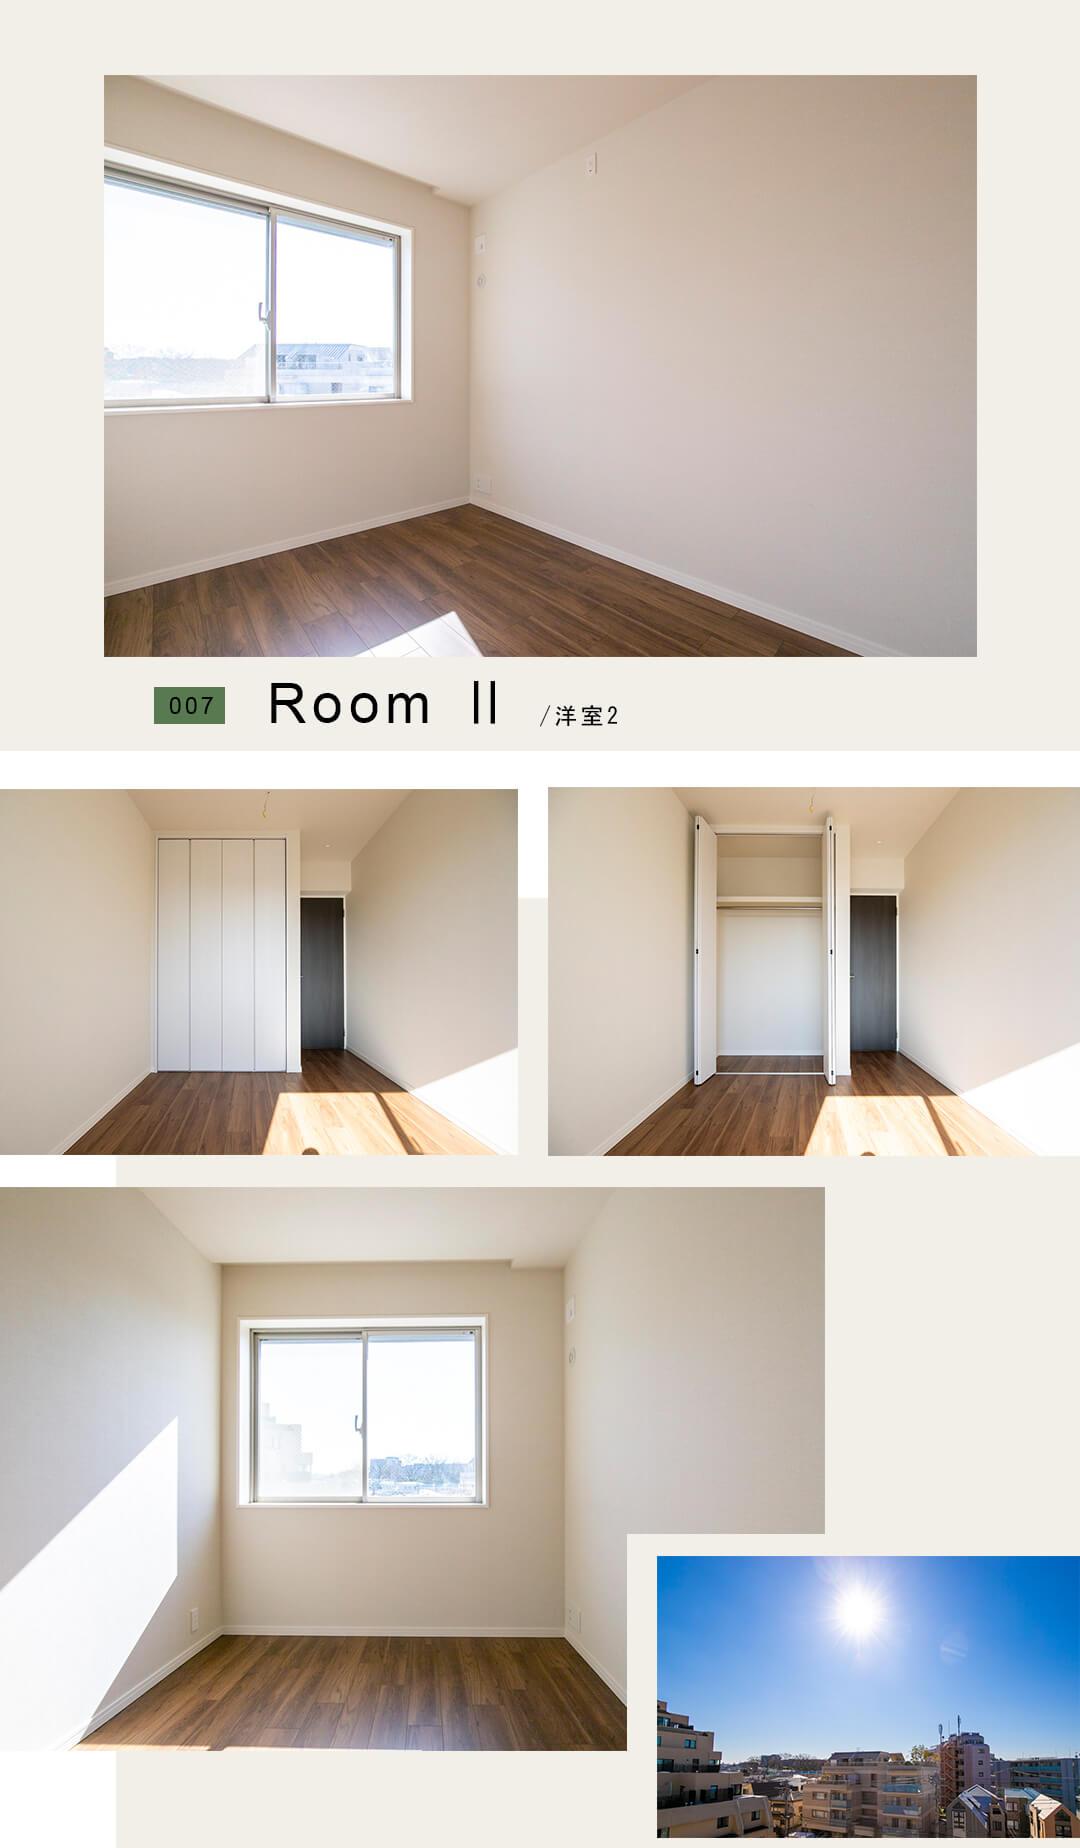 007,roomⅡ,洋室2